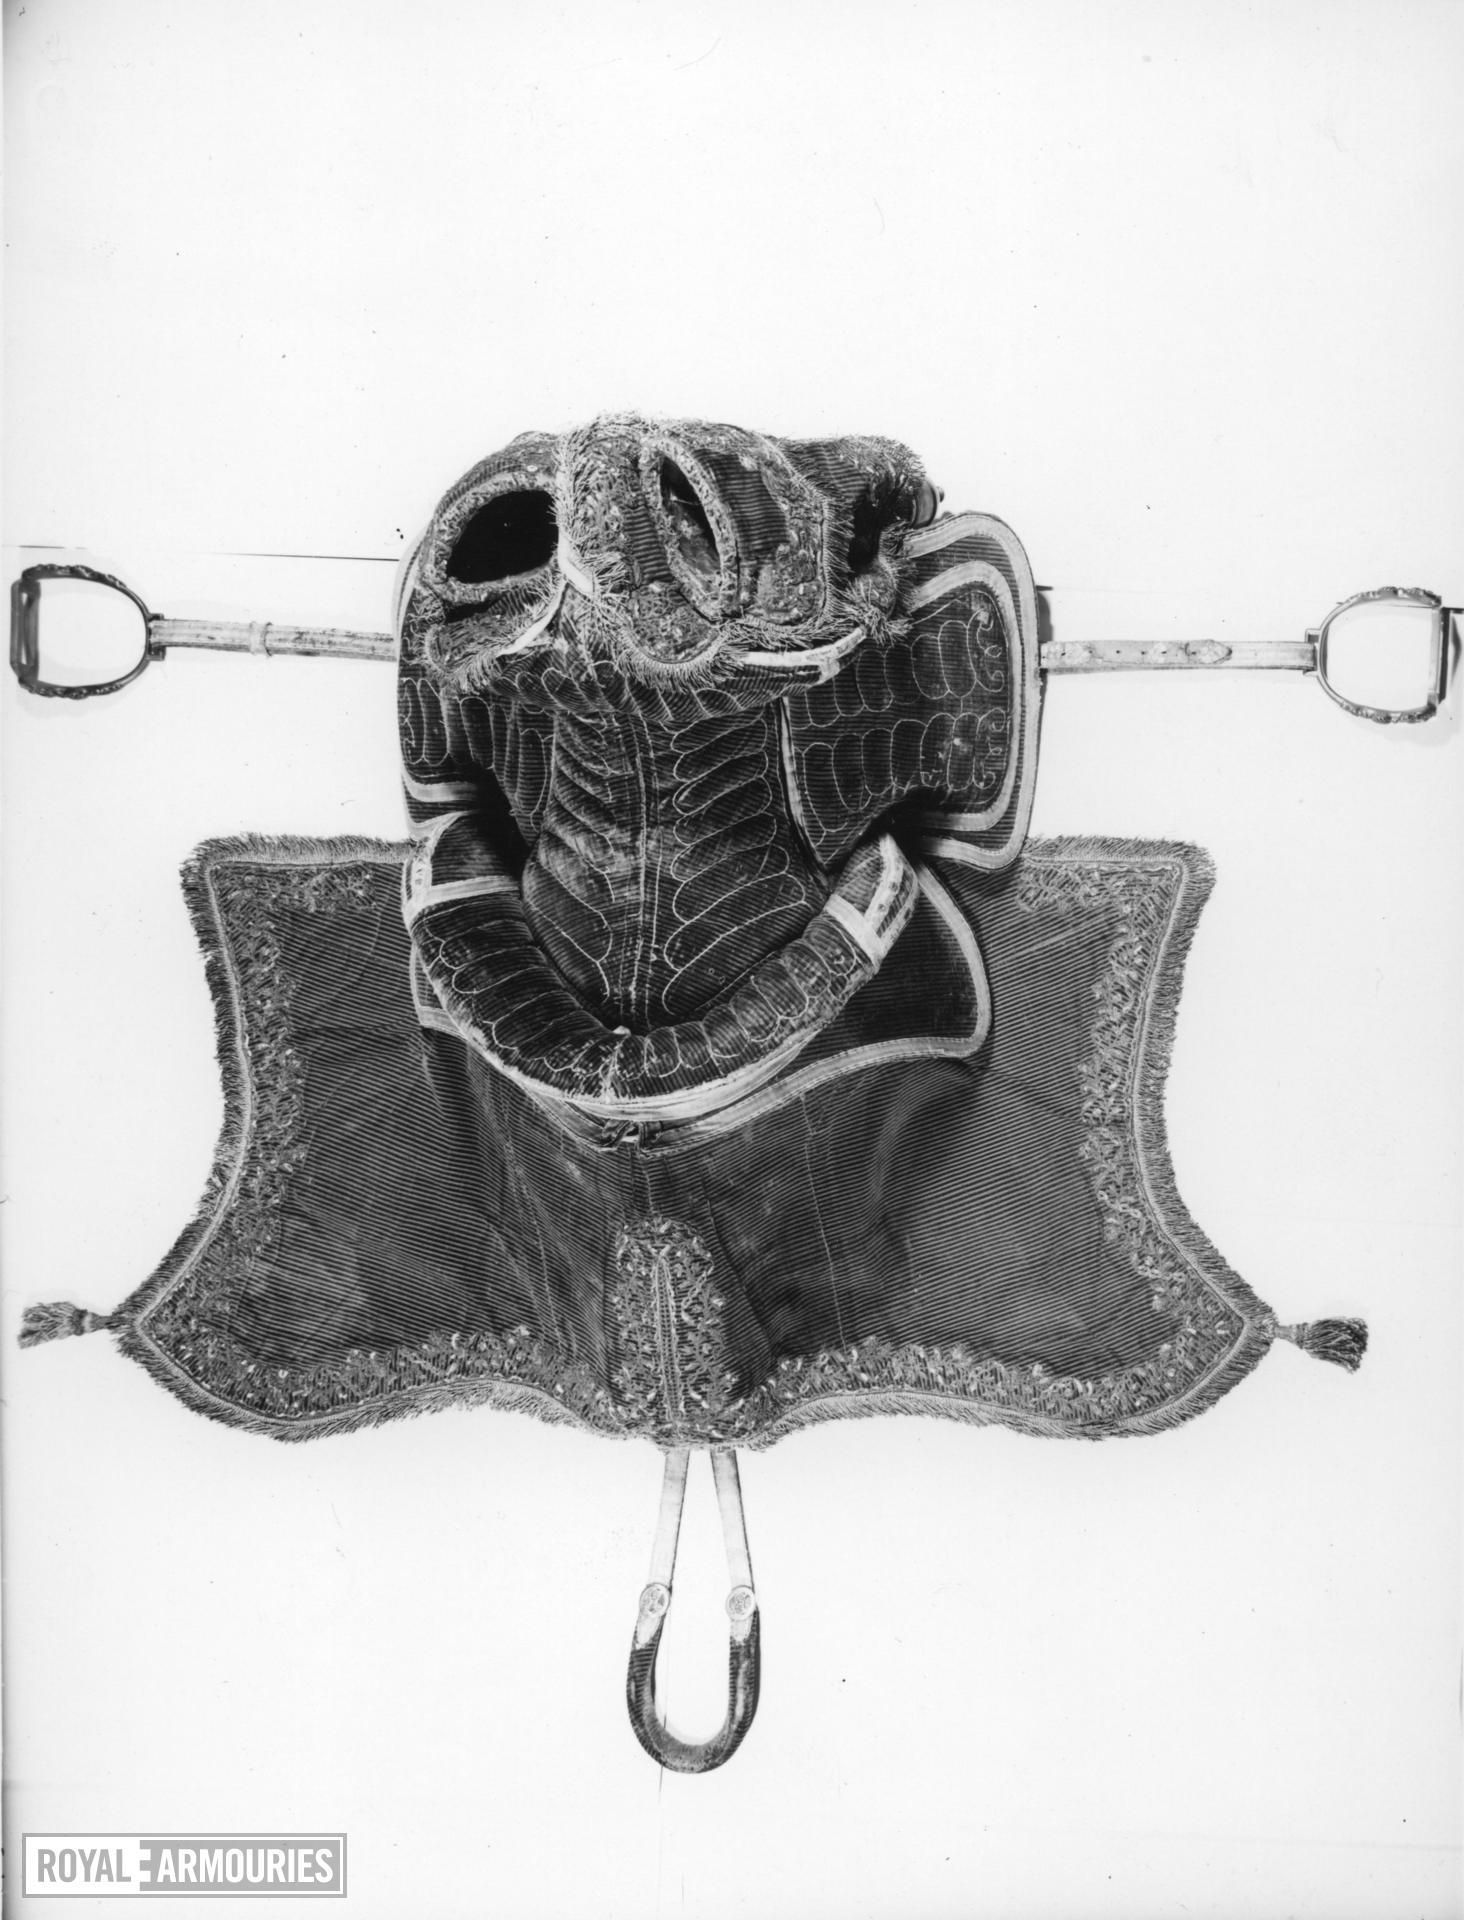 Saddle Of Ernst August, Grand Duke of Saxe-Weimar-Eisenach (1688-1748)